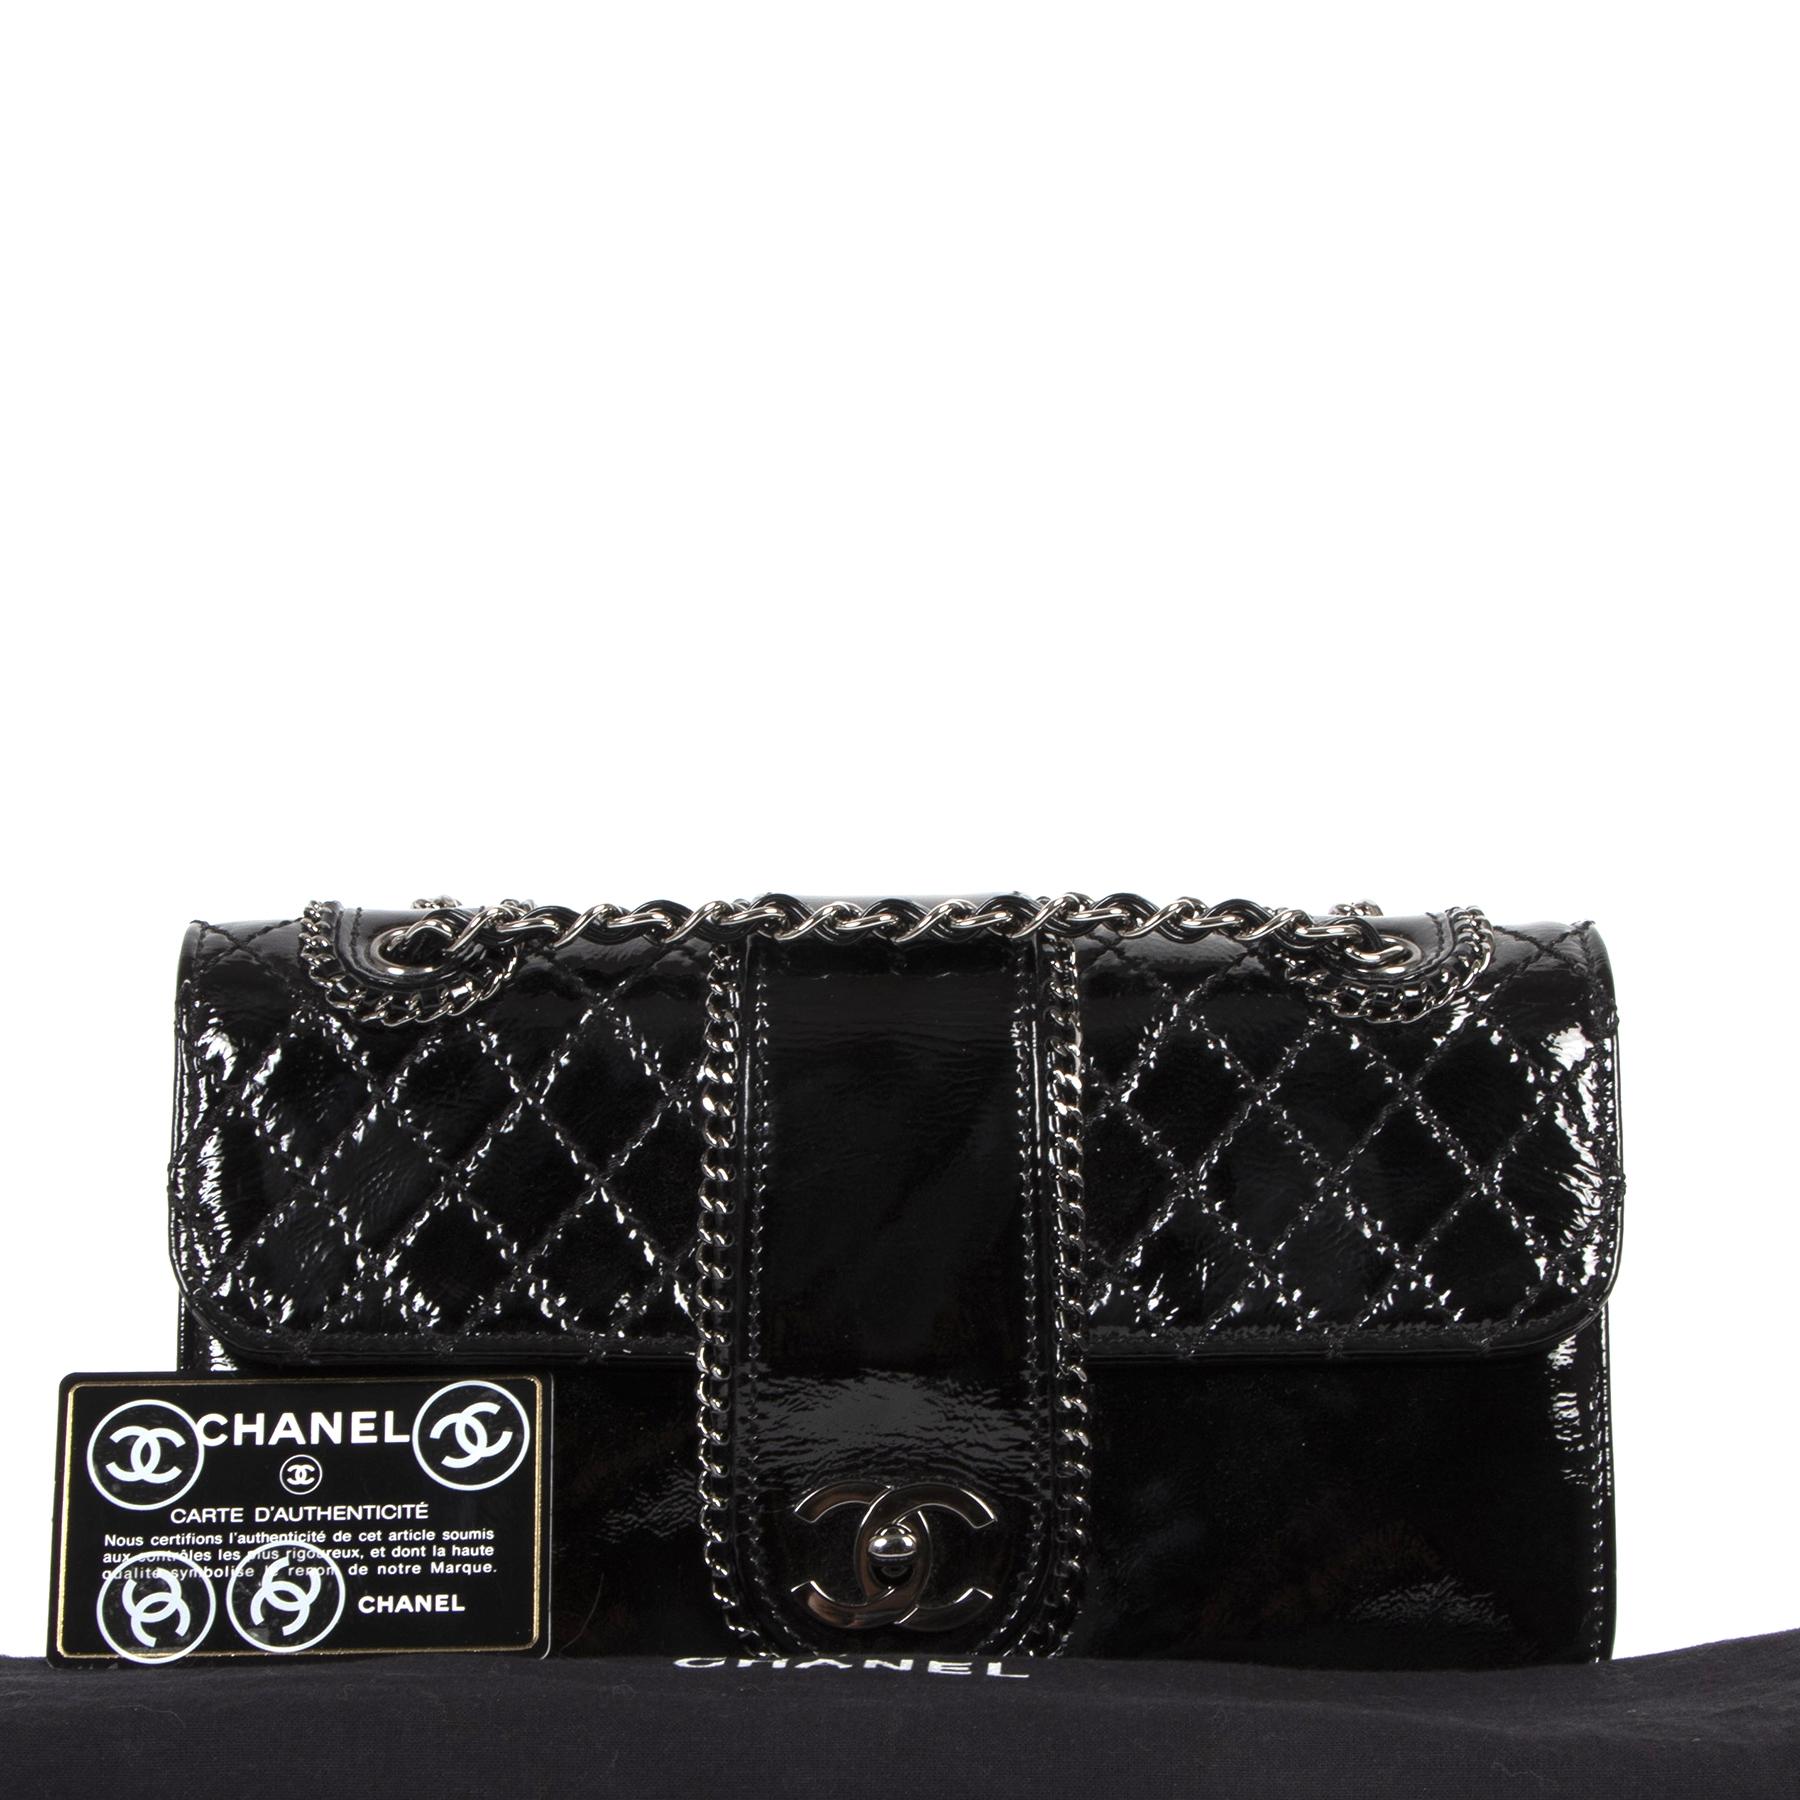 Authentic secondhand Chanel Black Patent Leather Madison Flap Bag designer bags luxury vintage webshop fashion safe secure online shopping